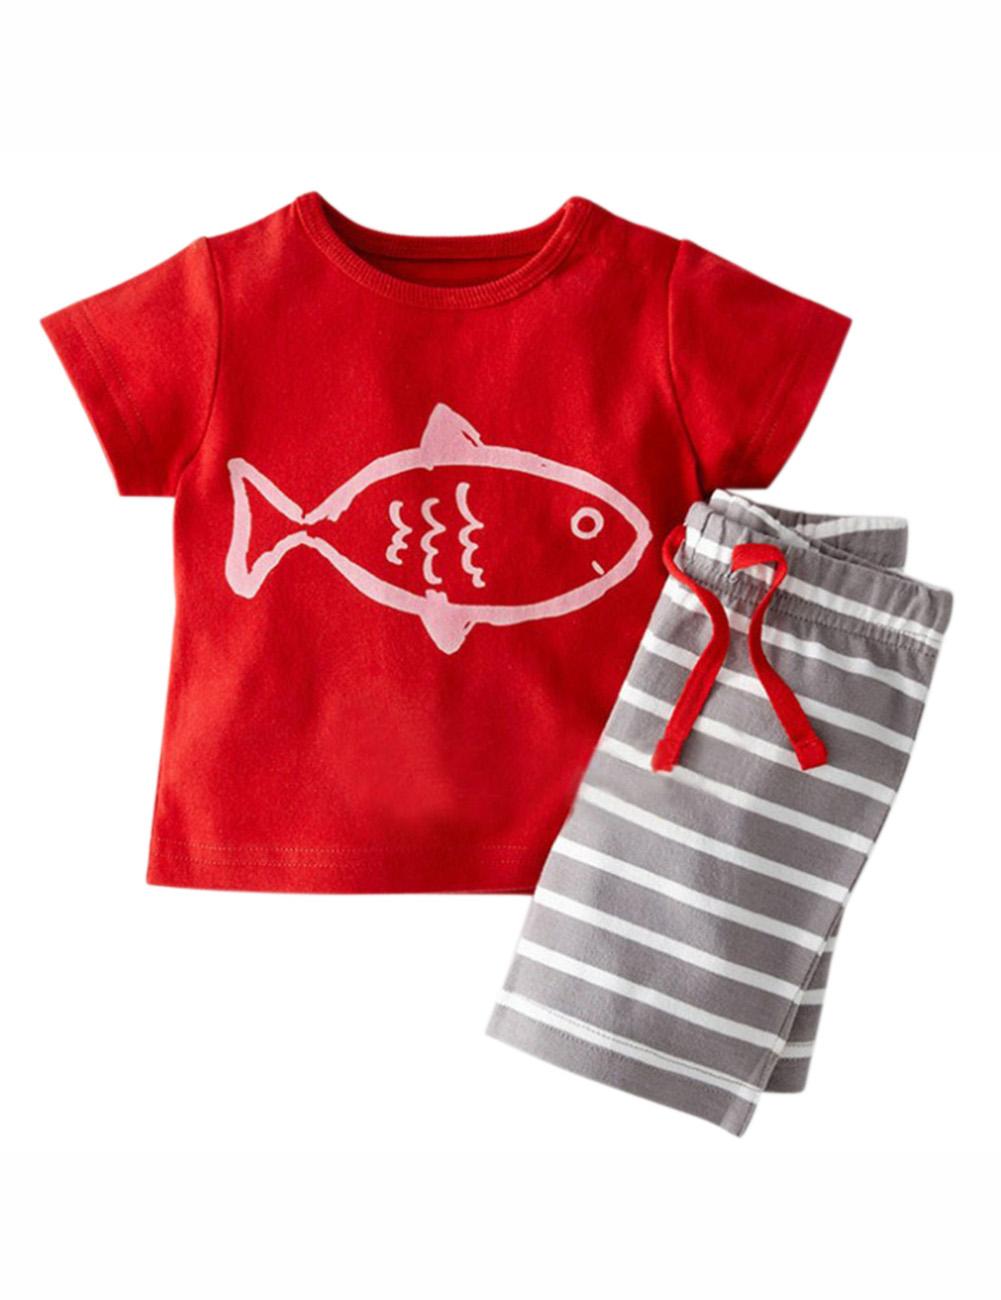 Kidlove Lovely Stripe Cute Cartoon Toddler Kids Baby Boy Clothes Cotton Tops&Pants Set